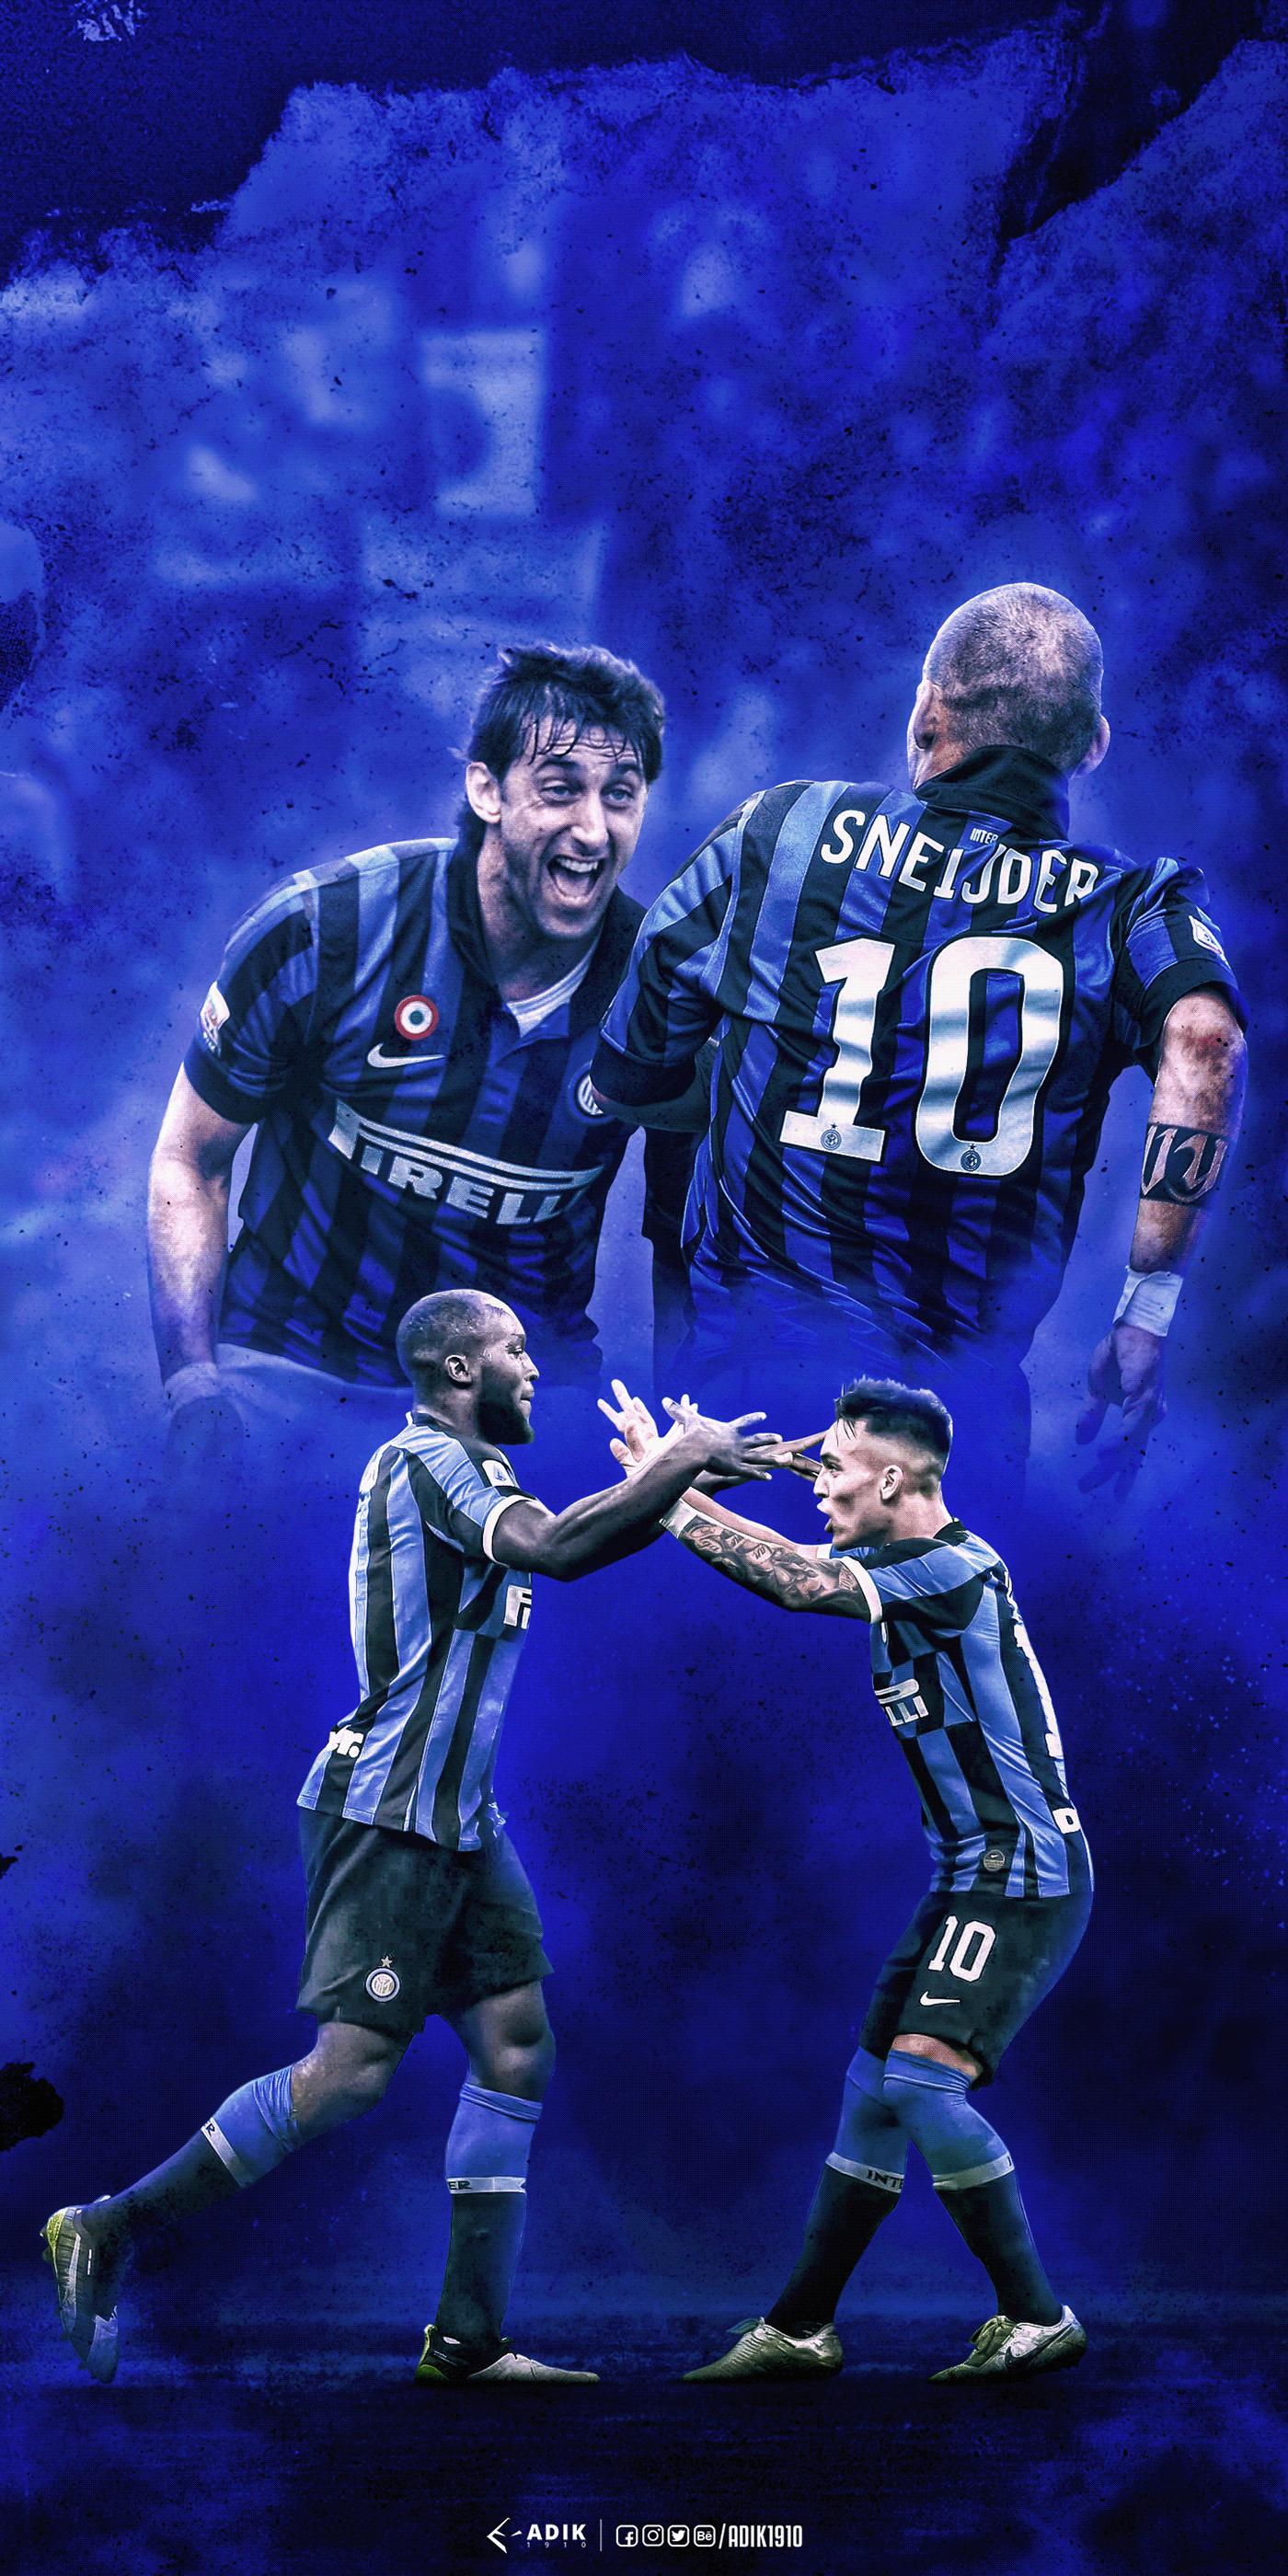 Pin By Sergey Panfilov On Sport In 2020 Football Wallpaper Inter Milan Neymar Football